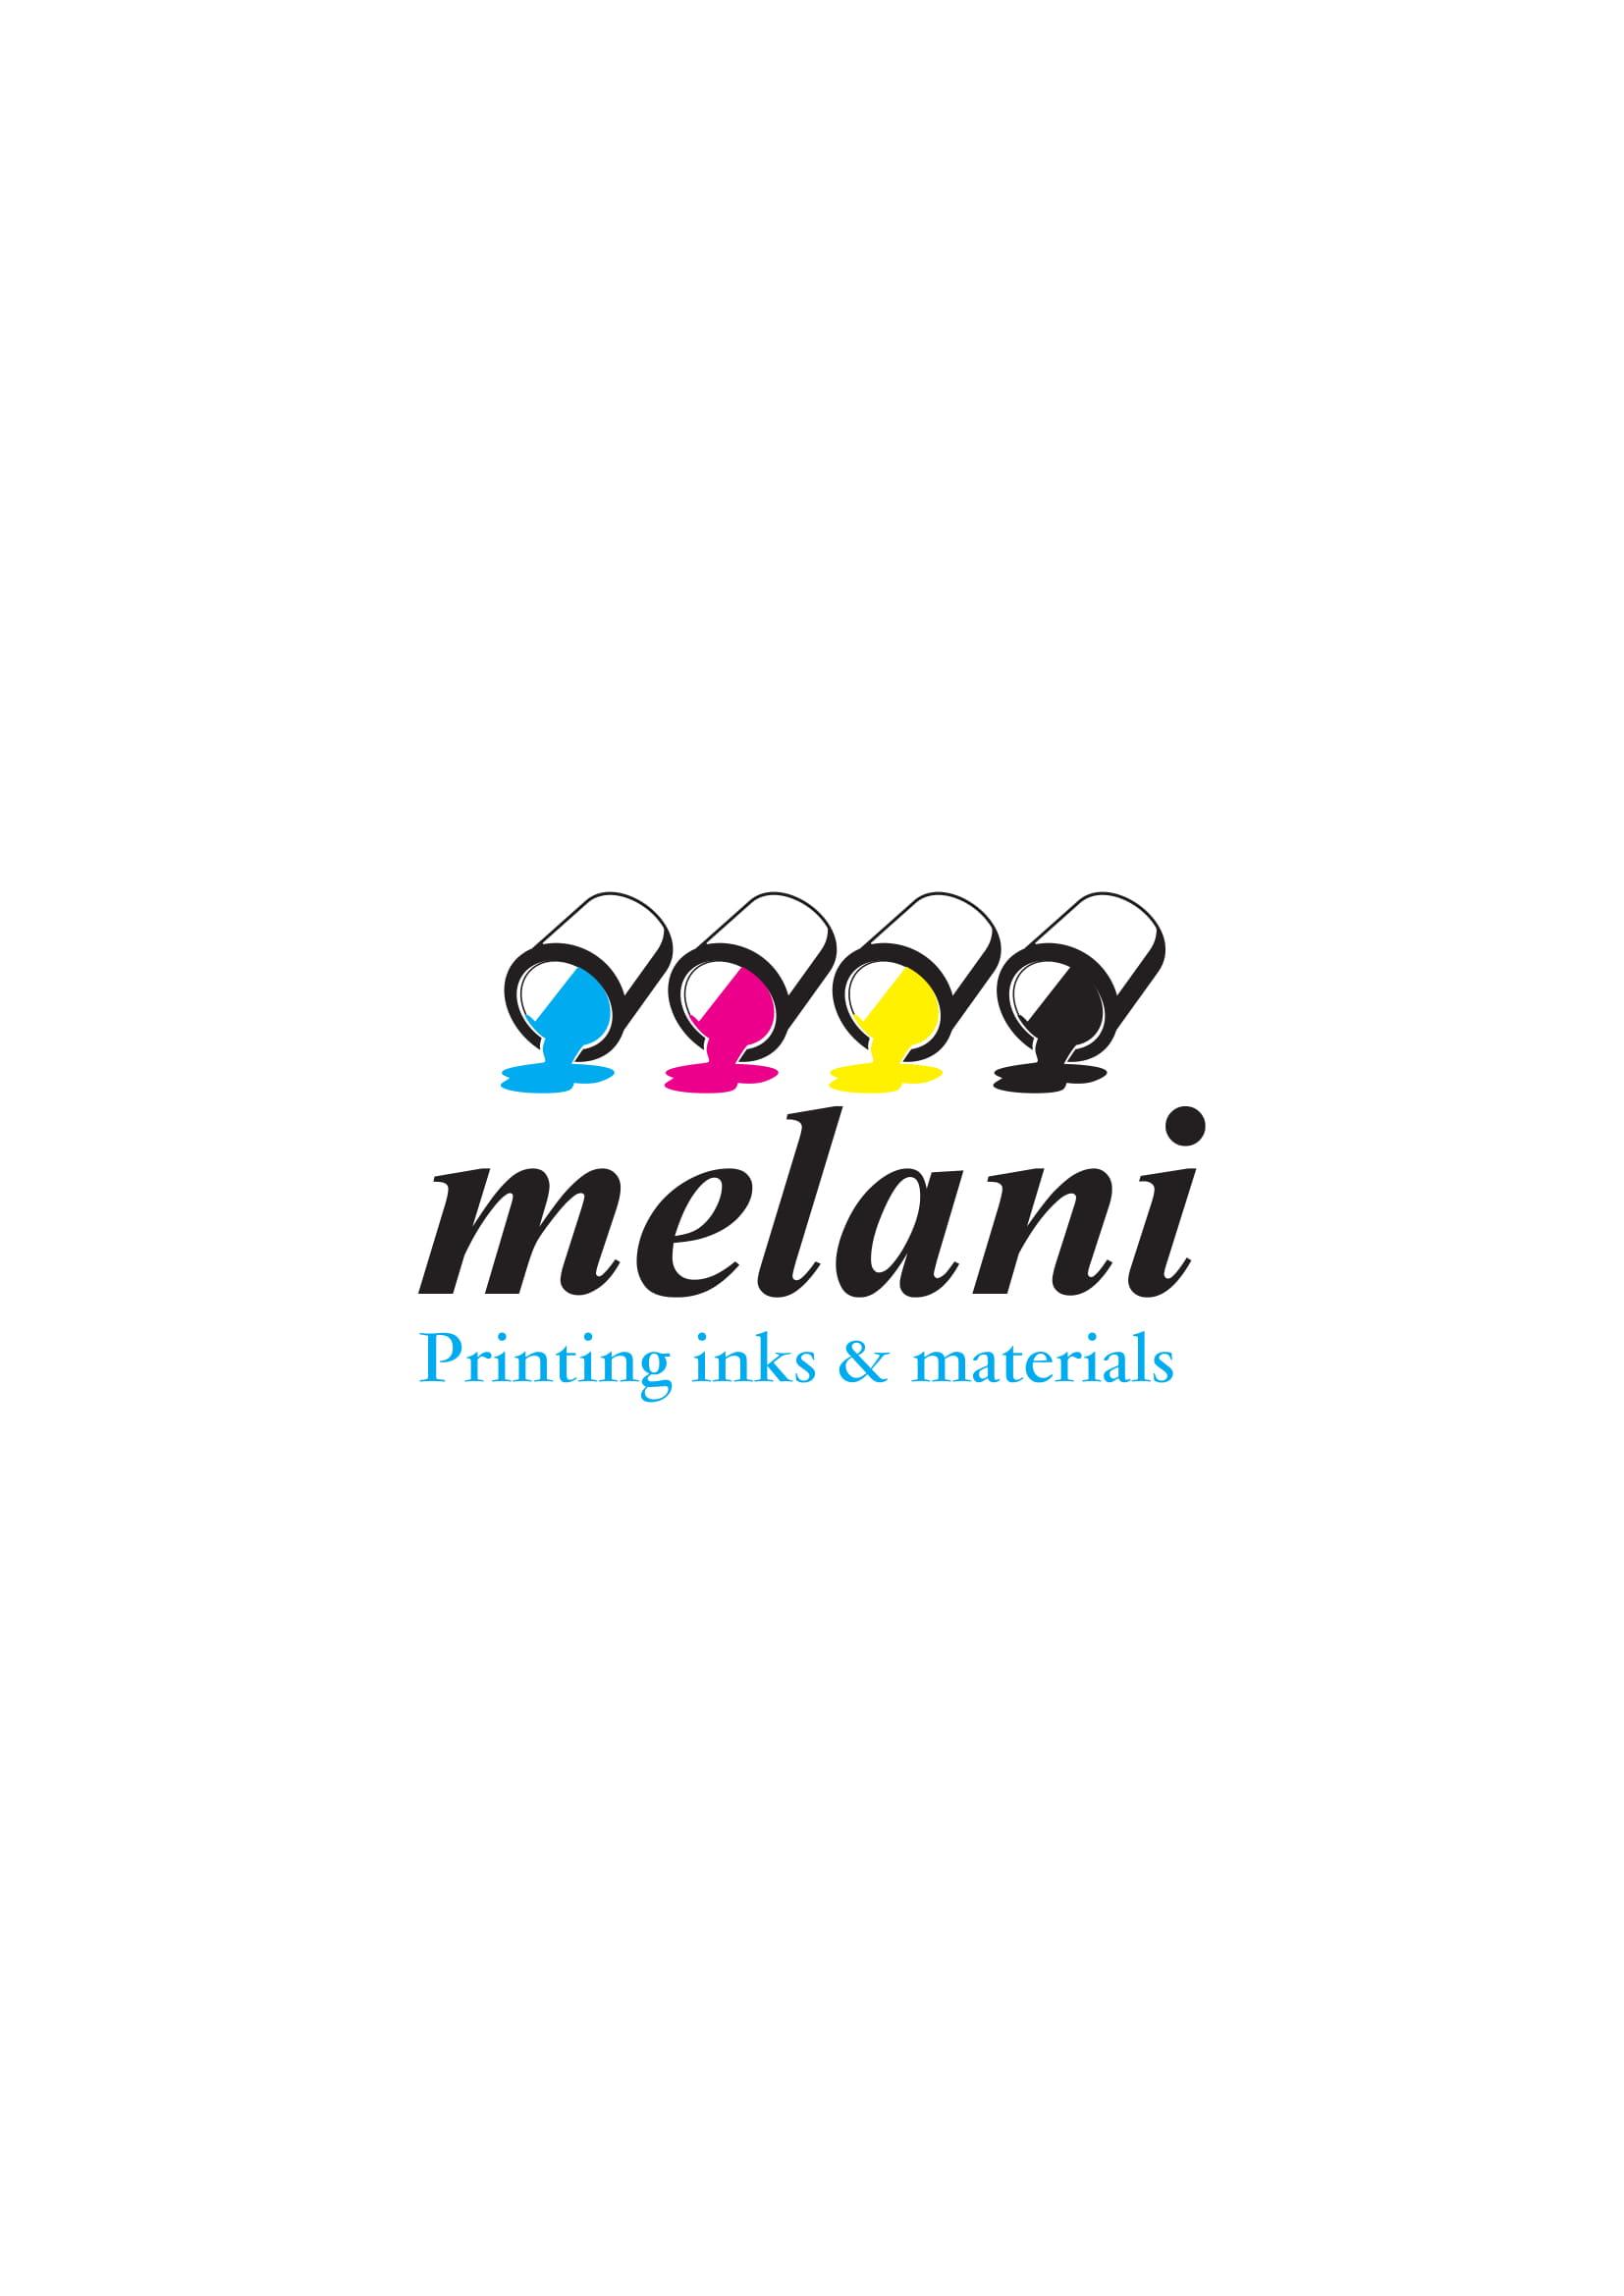 Click on image to go to Melani